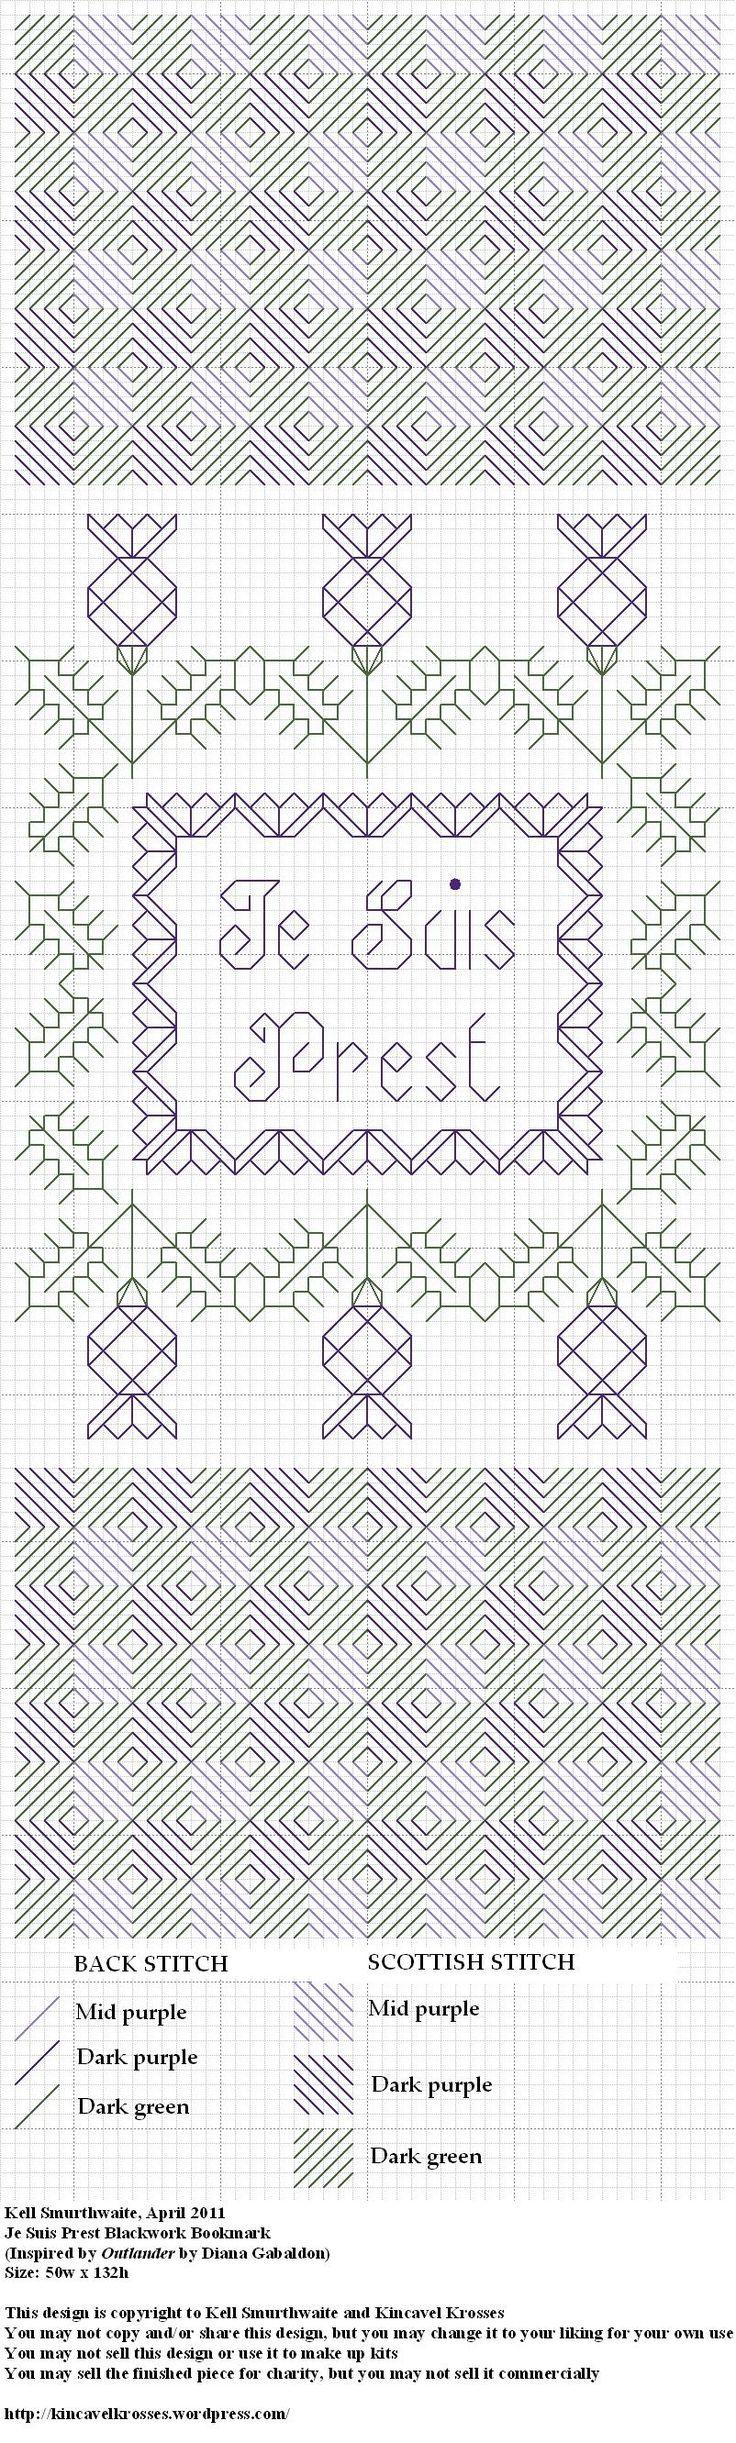 Design: Je Suis Prest Blackwork Bookmark (Inspired by Outlander by Diana Gabaldon) Size: 50w x 132h Designer: Kell Smurthwaite, Kincavel Krosses Permissions: This design is copyright to Kell Smurth...